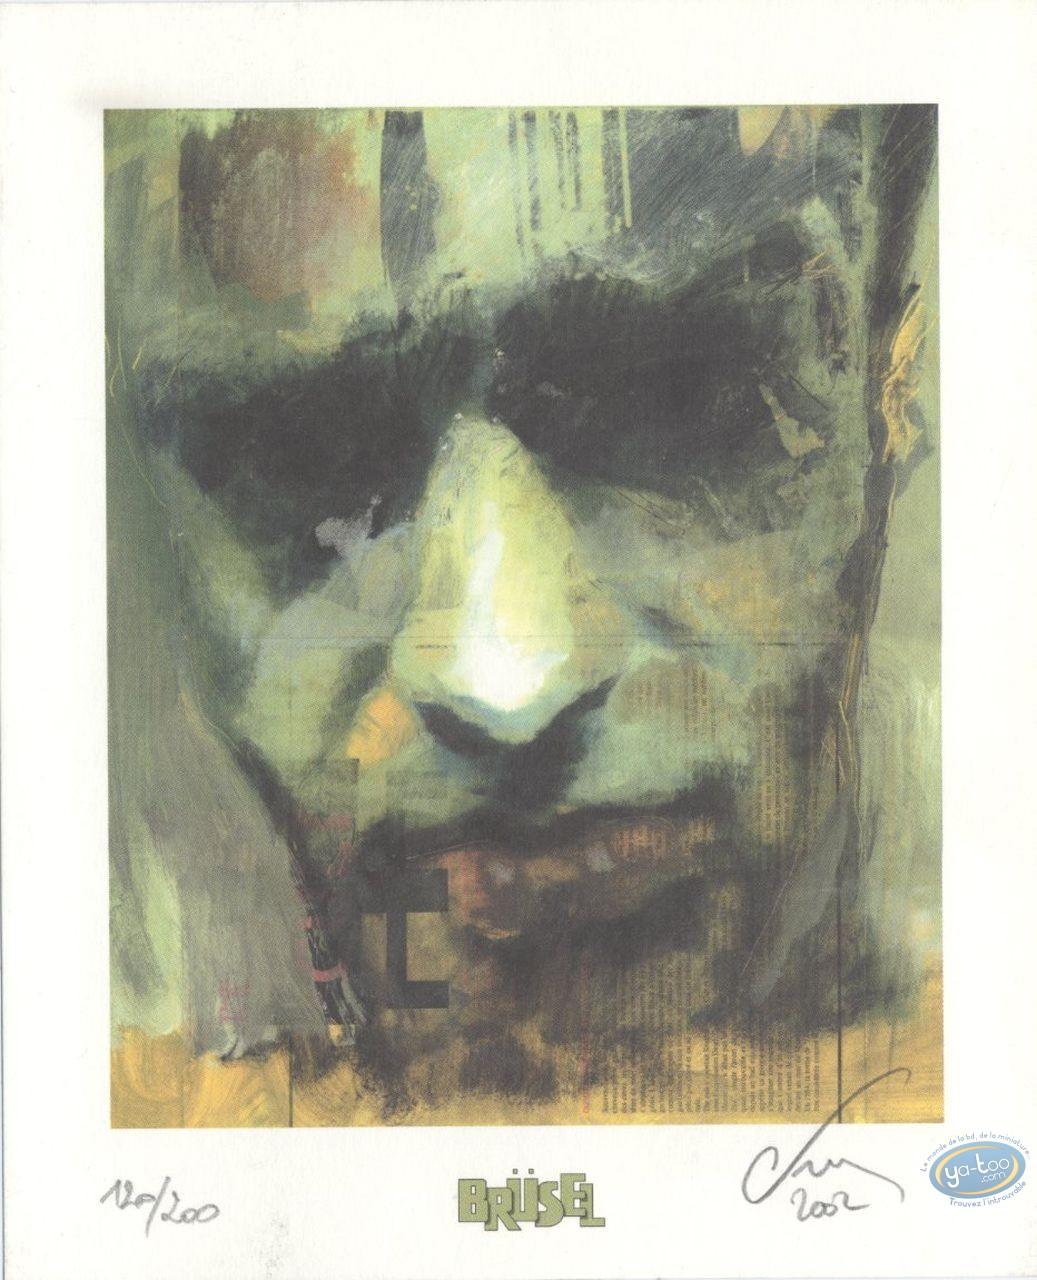 Ex-libris Offset, Dusk : Visage